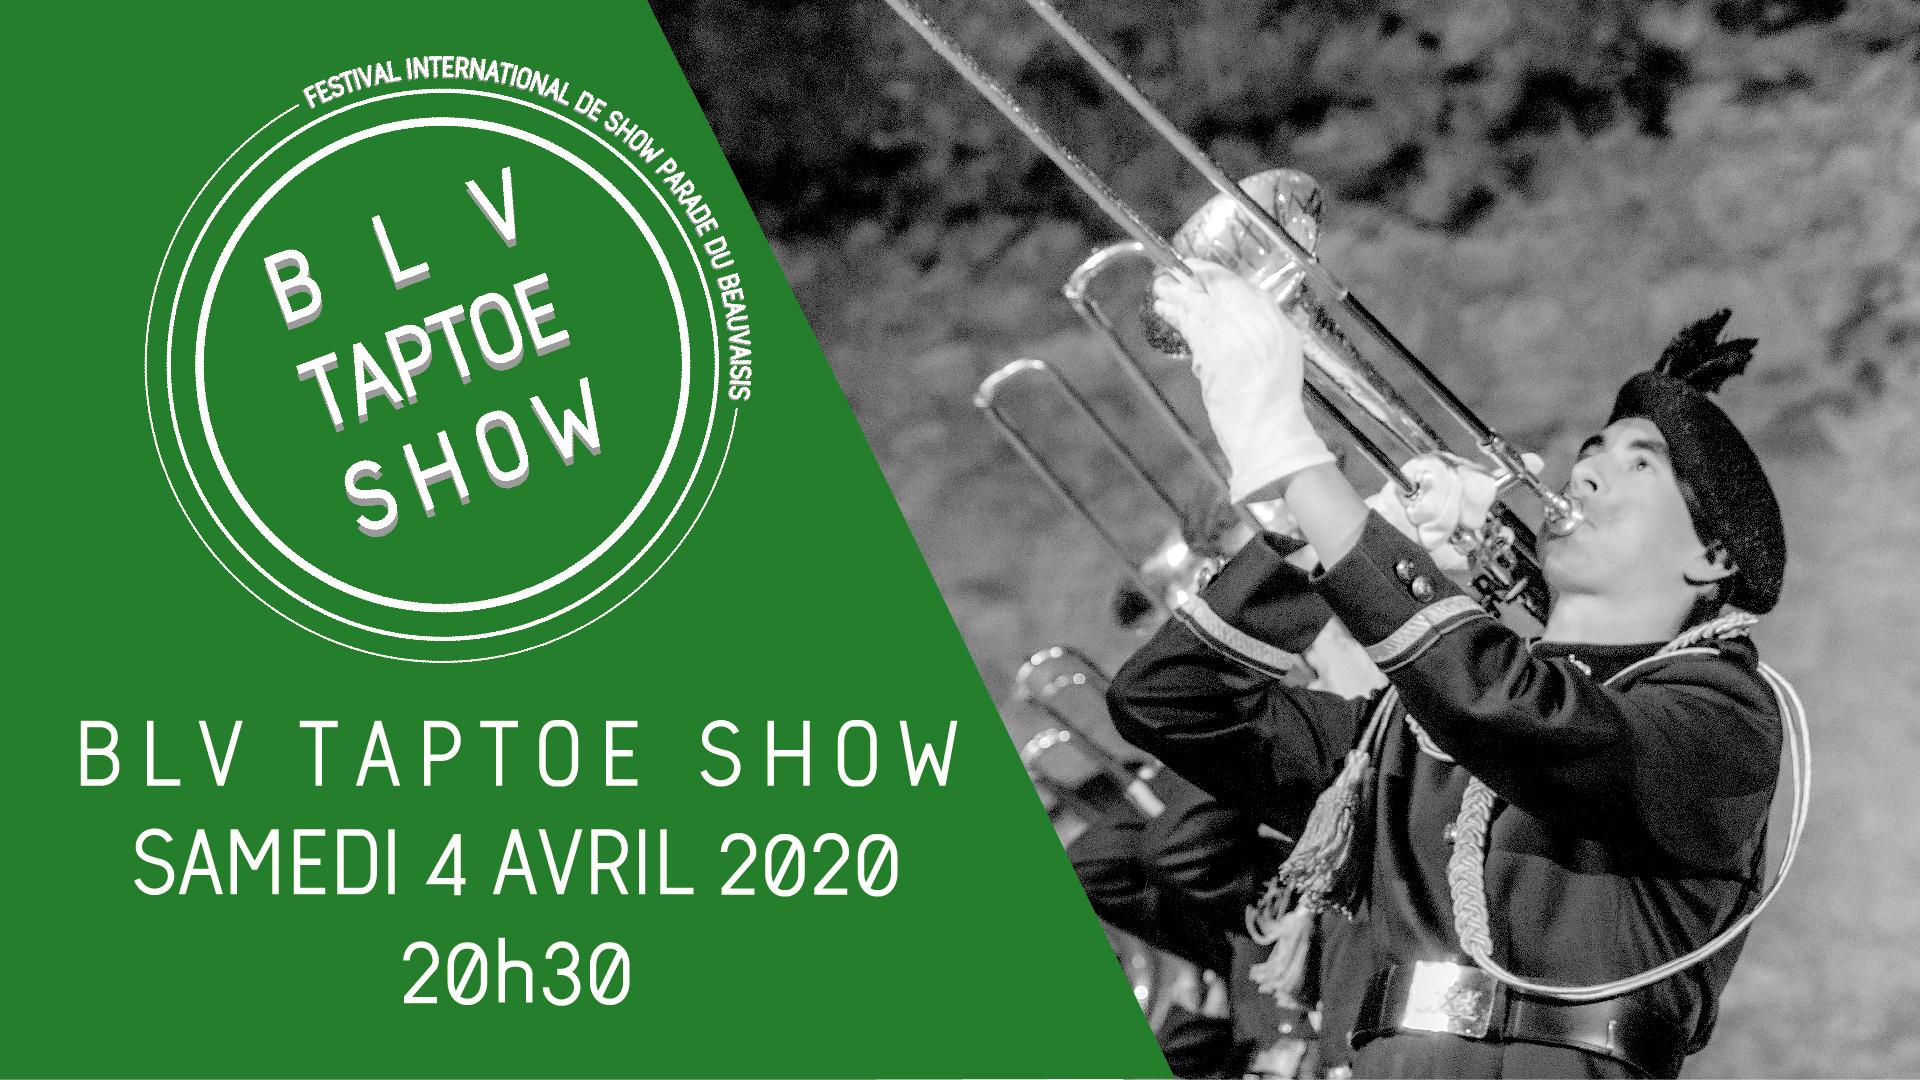 BLV Taptoe Show